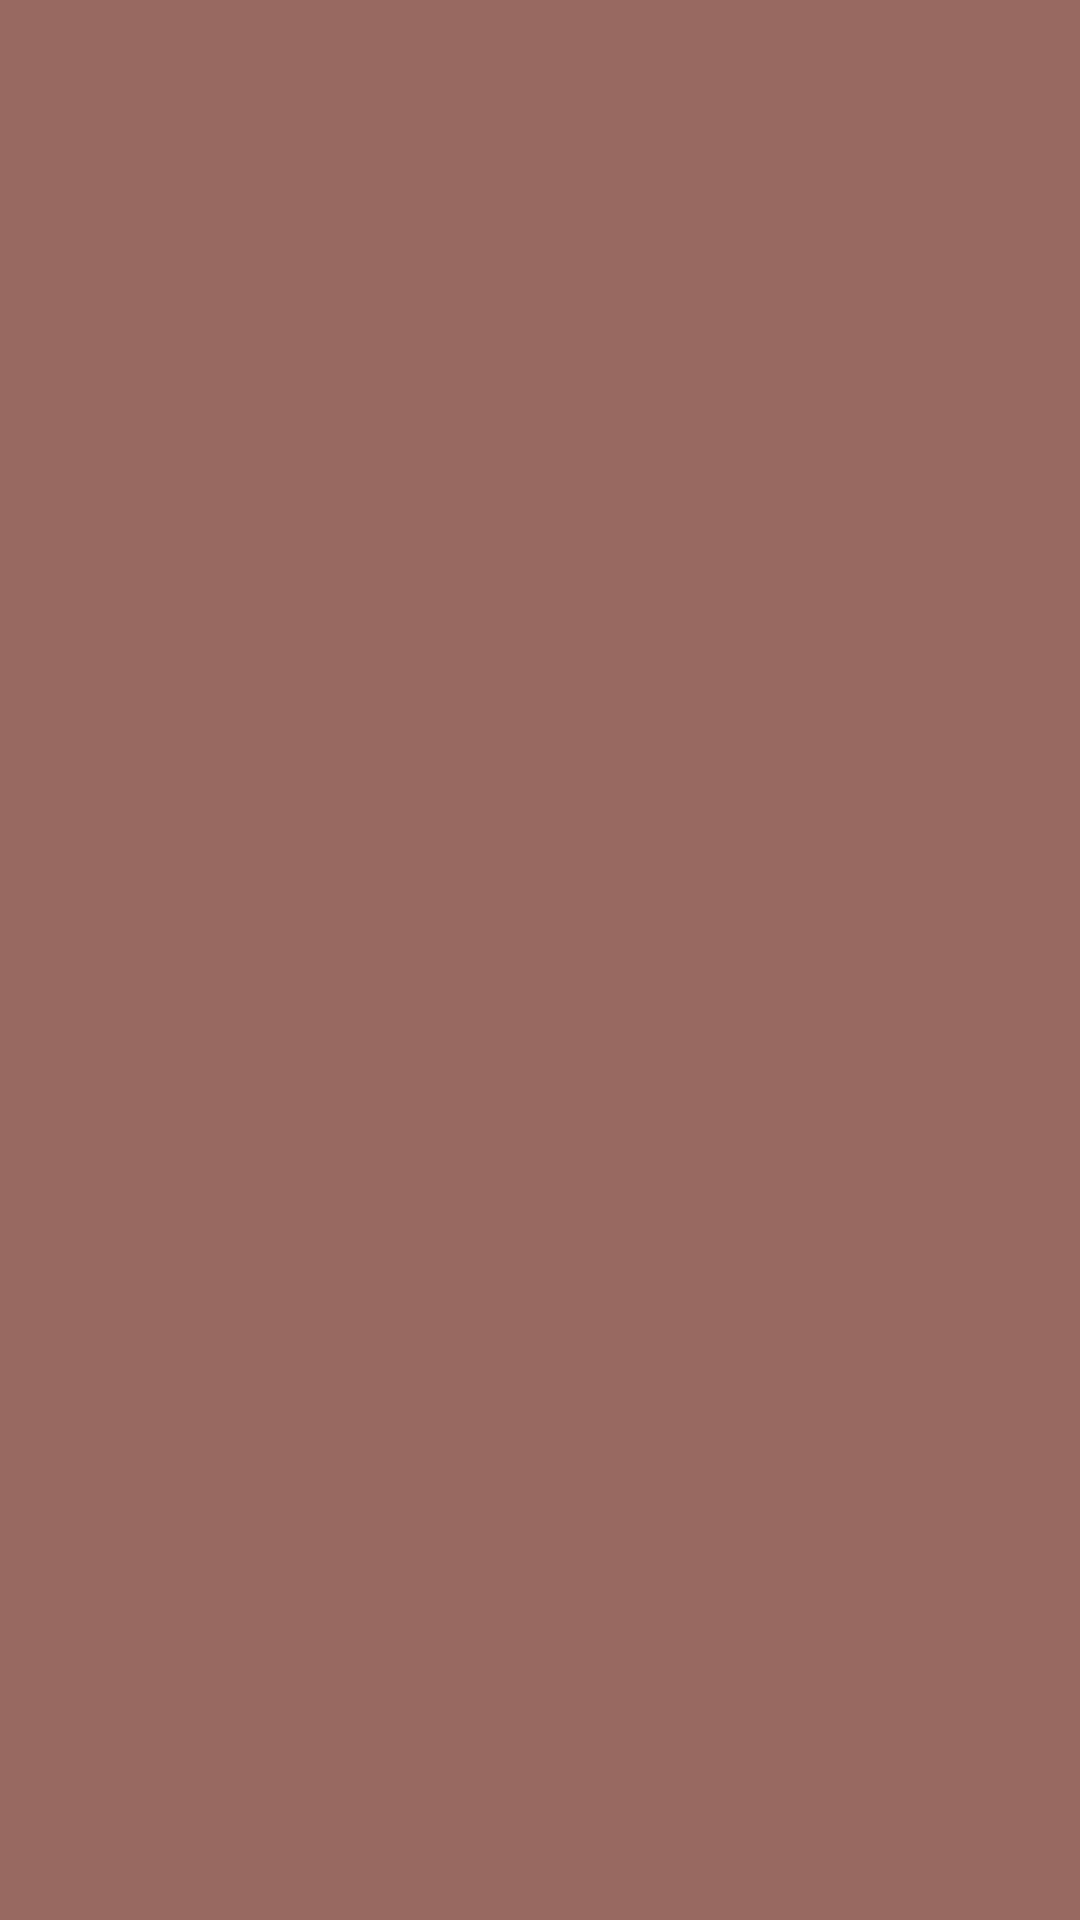 1080x1920 Dark Chestnut Solid Color Background